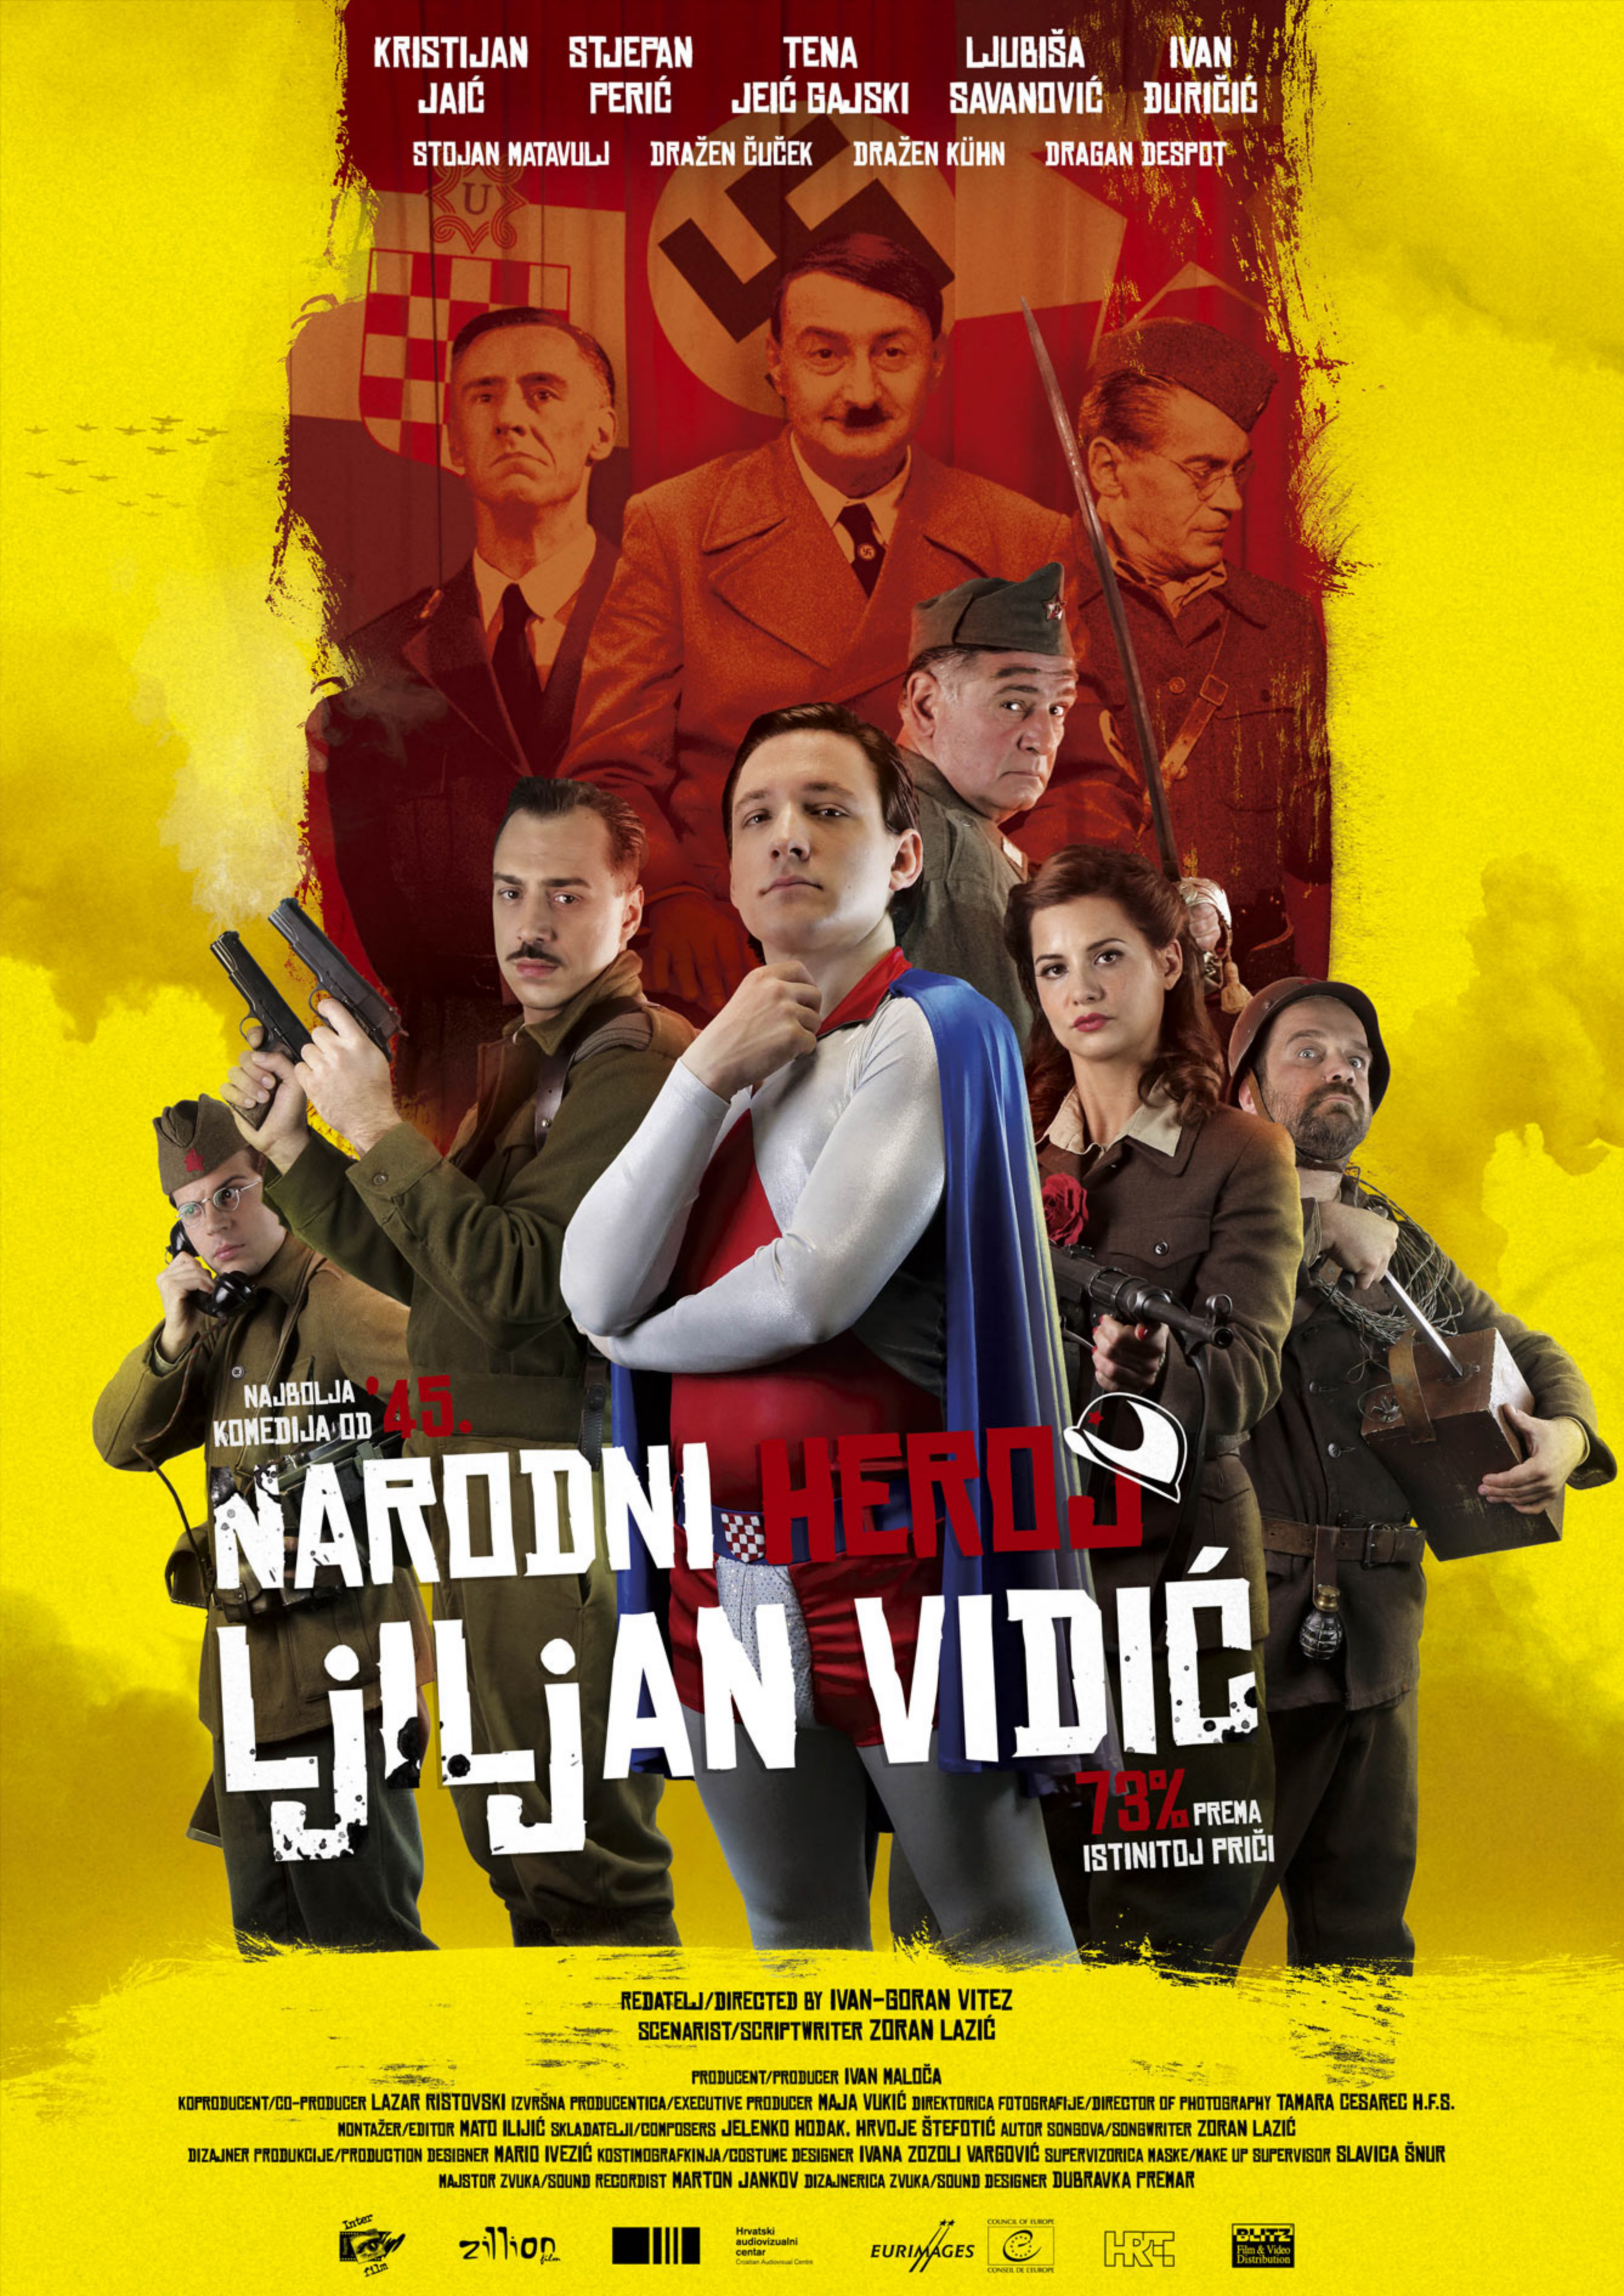 Narodni Heroj Ljiljan Vidic 2015 Imdb